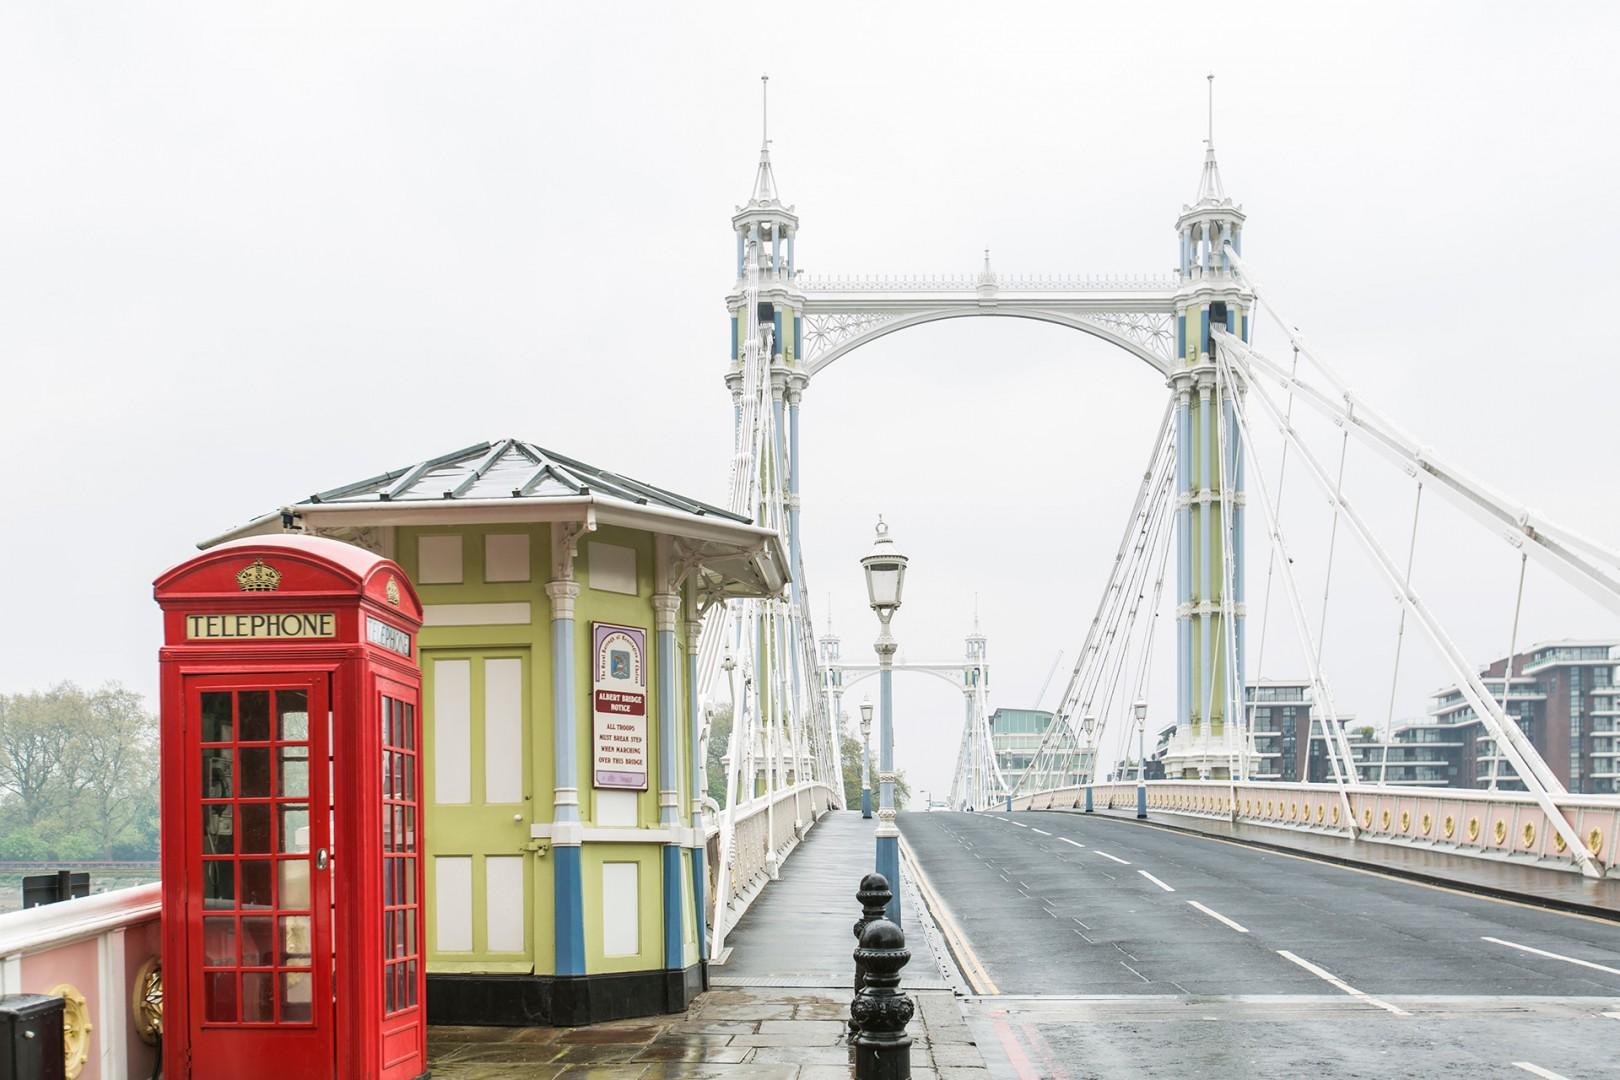 dcp-copyright-chelsea-albert-bridge-phone-booth-london